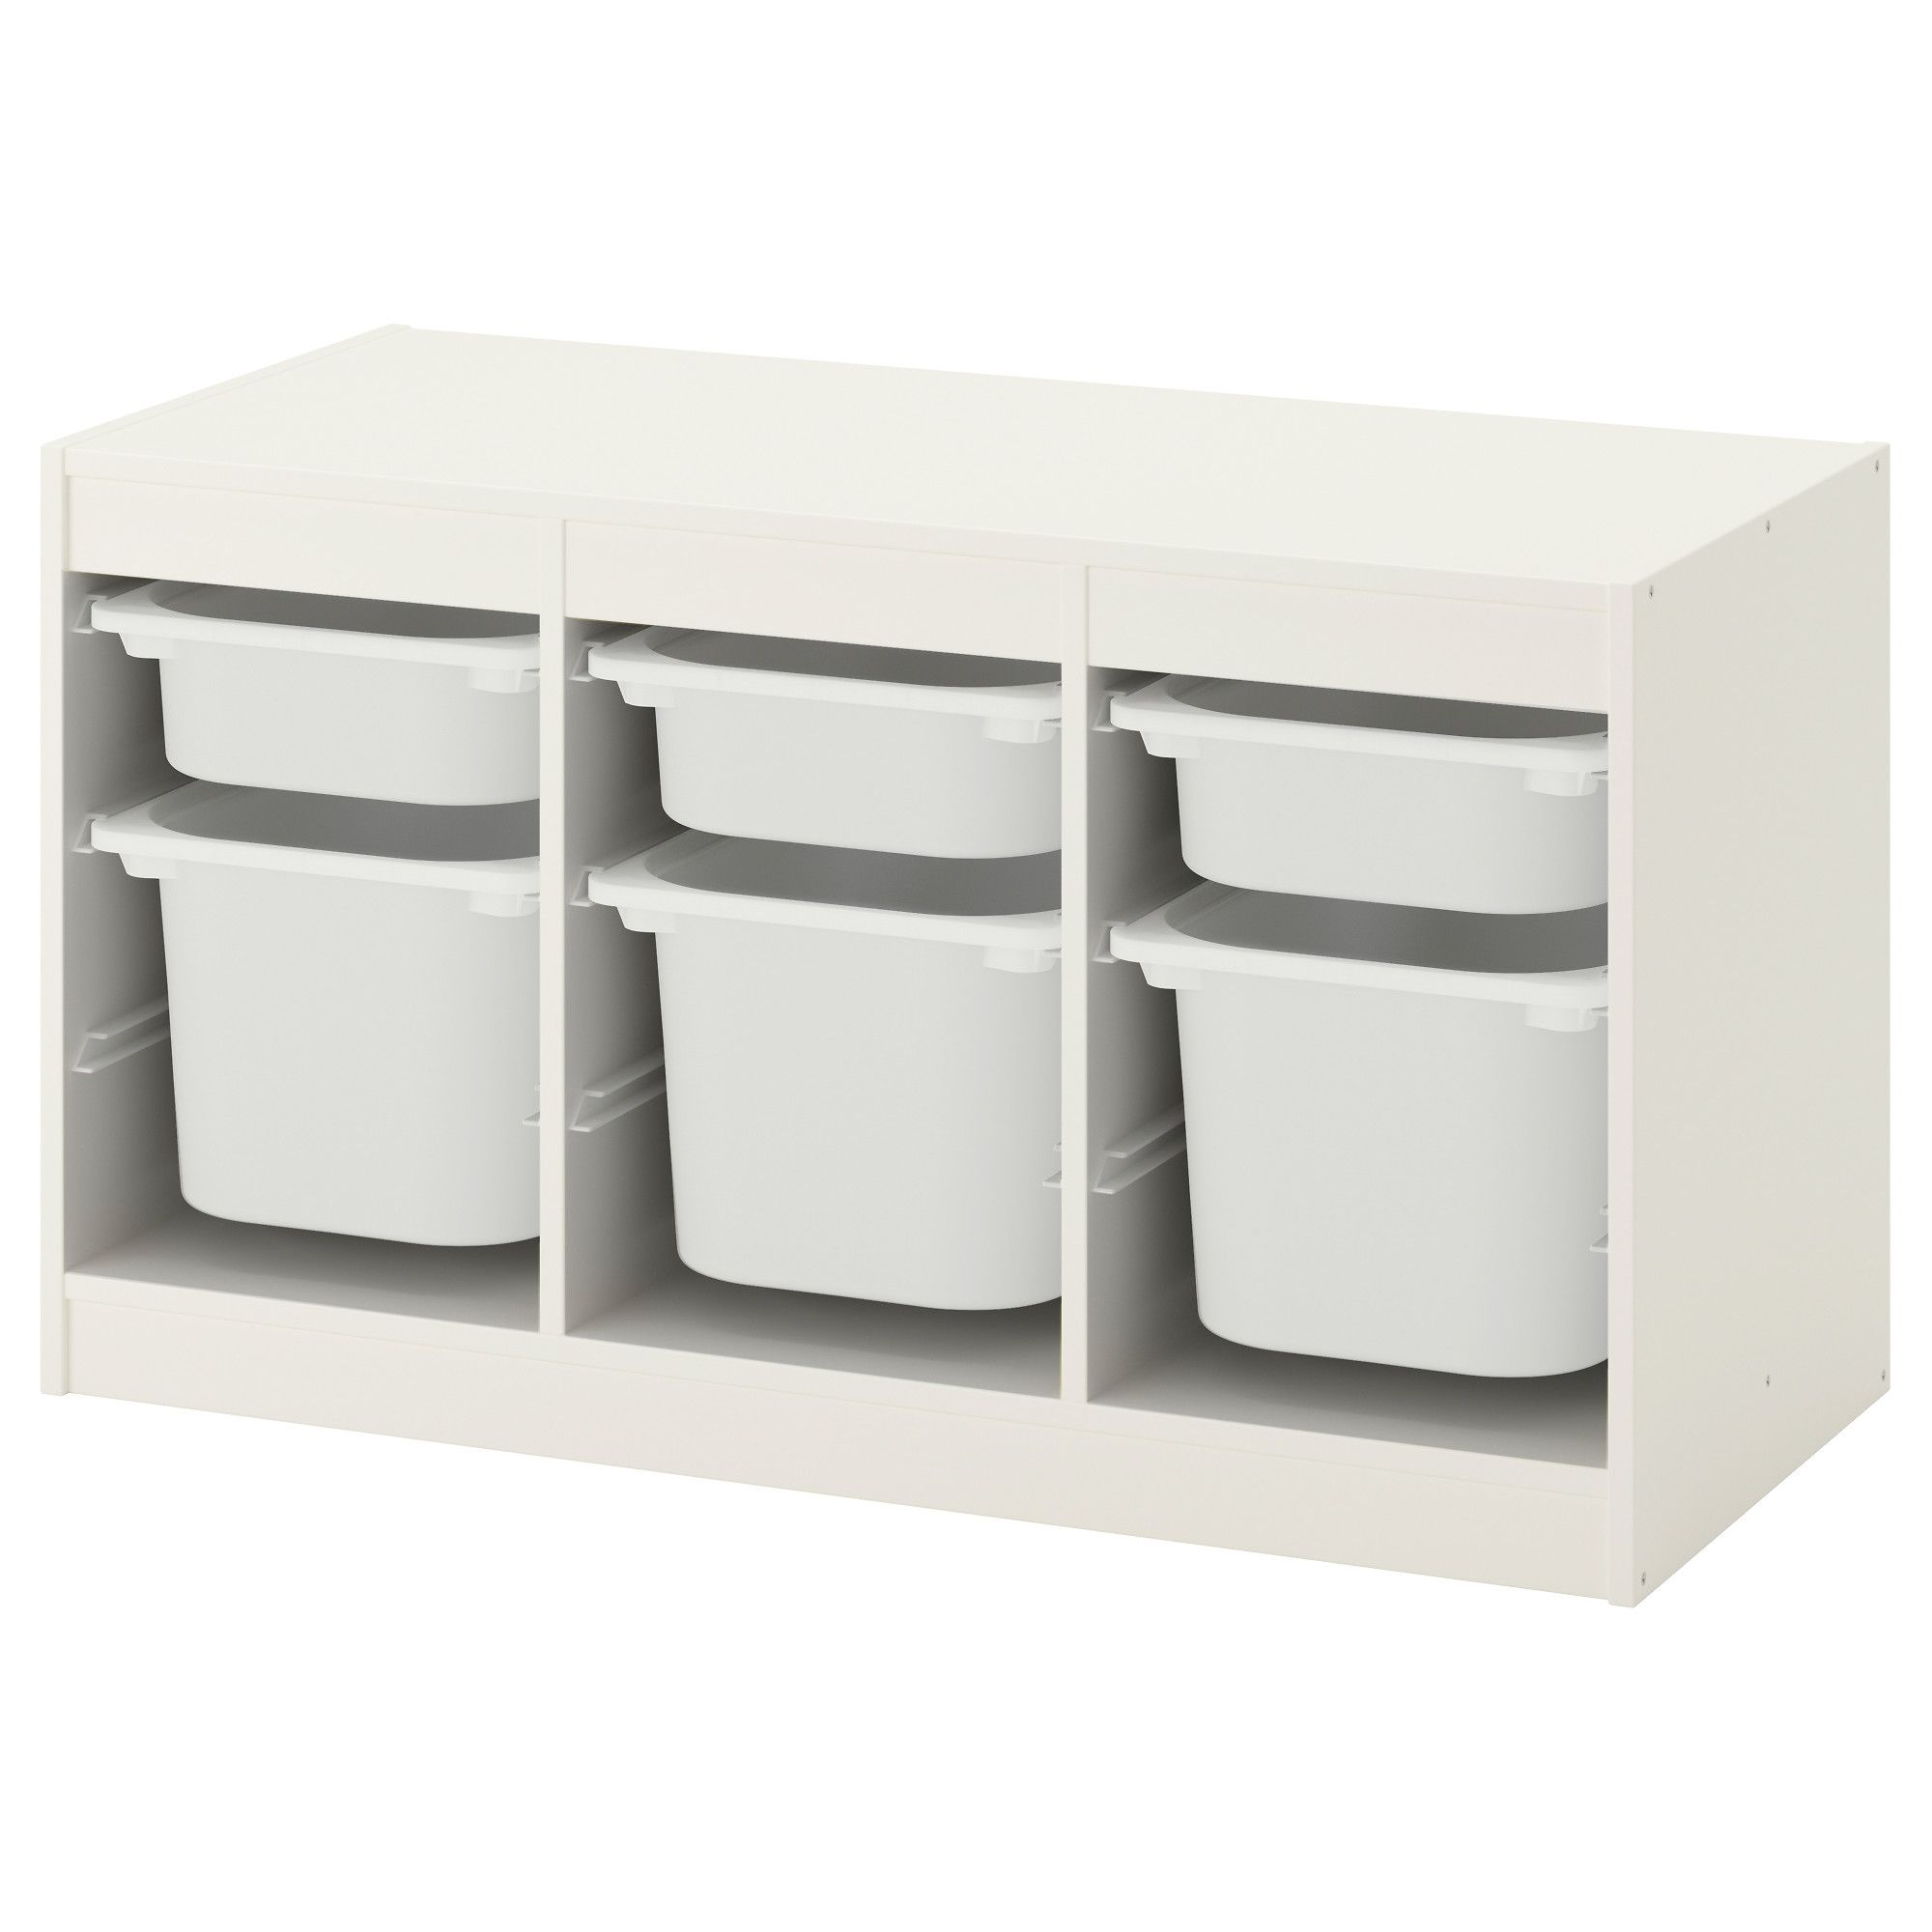 TROFAST Storage combination with boxes white, white